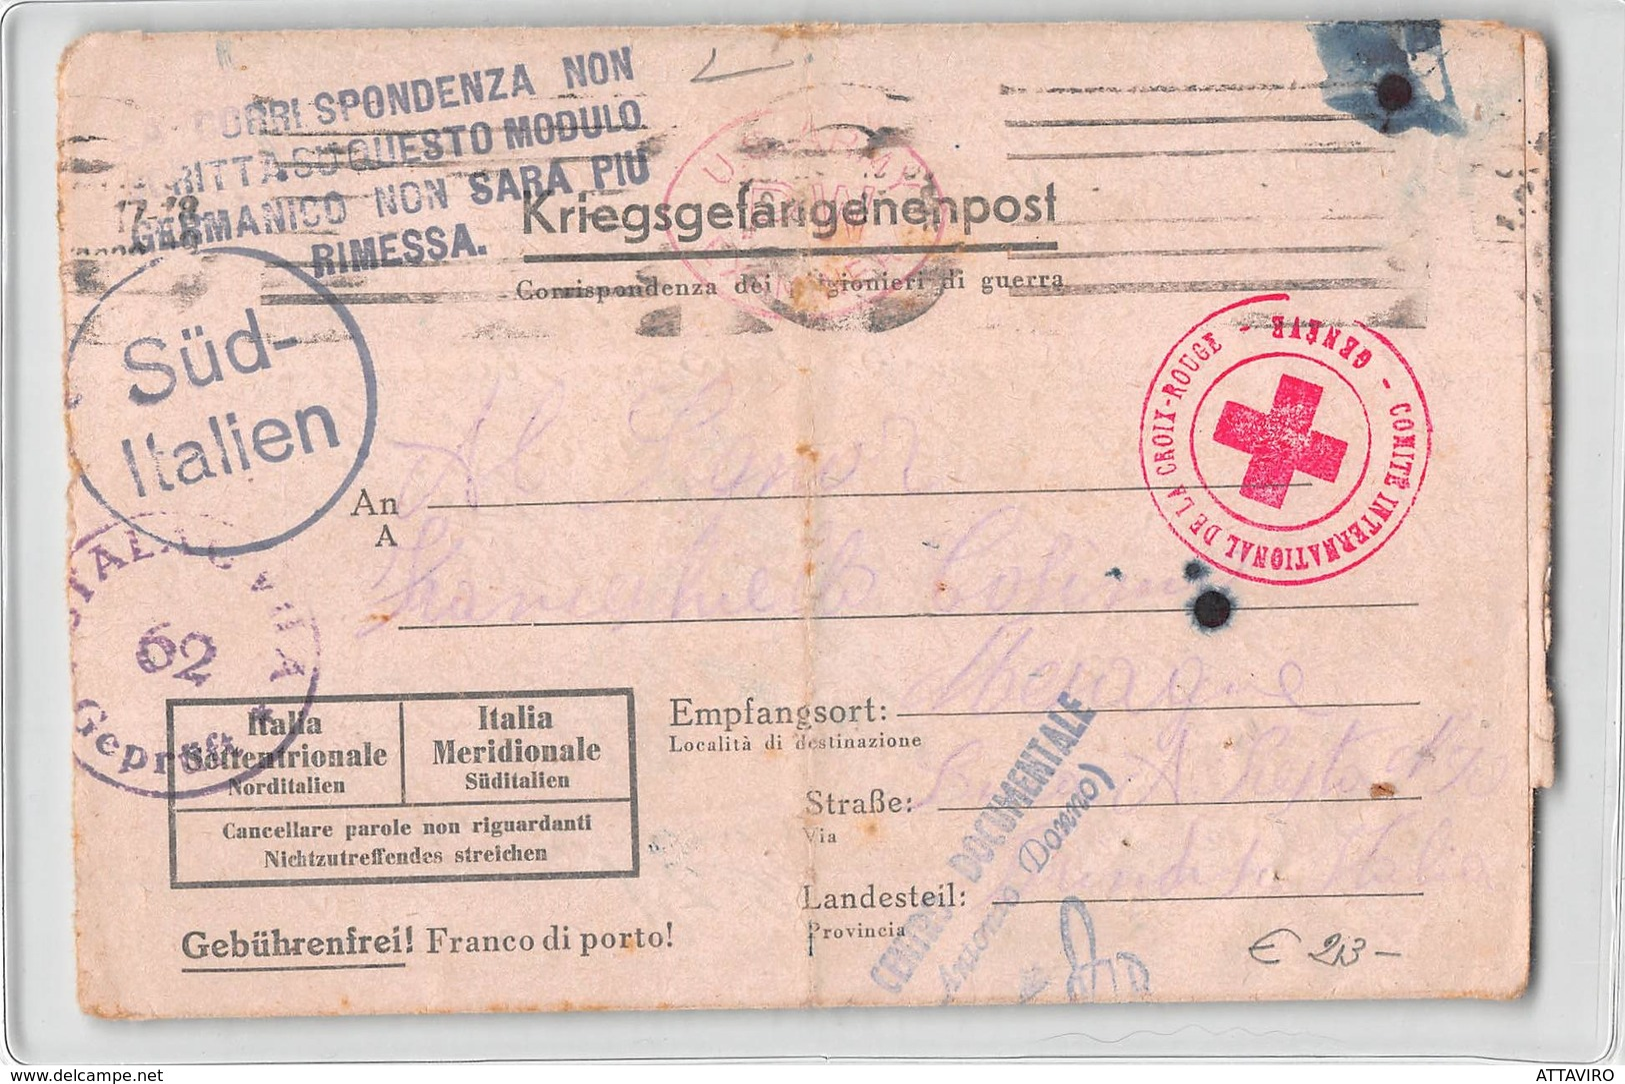 11925 01 KRIEGSGEFANGENENPOST ITALIAN PRISONER STALAG TO MESAGNE - RED CROSS - CENSORED US ARMY - Storia Postale